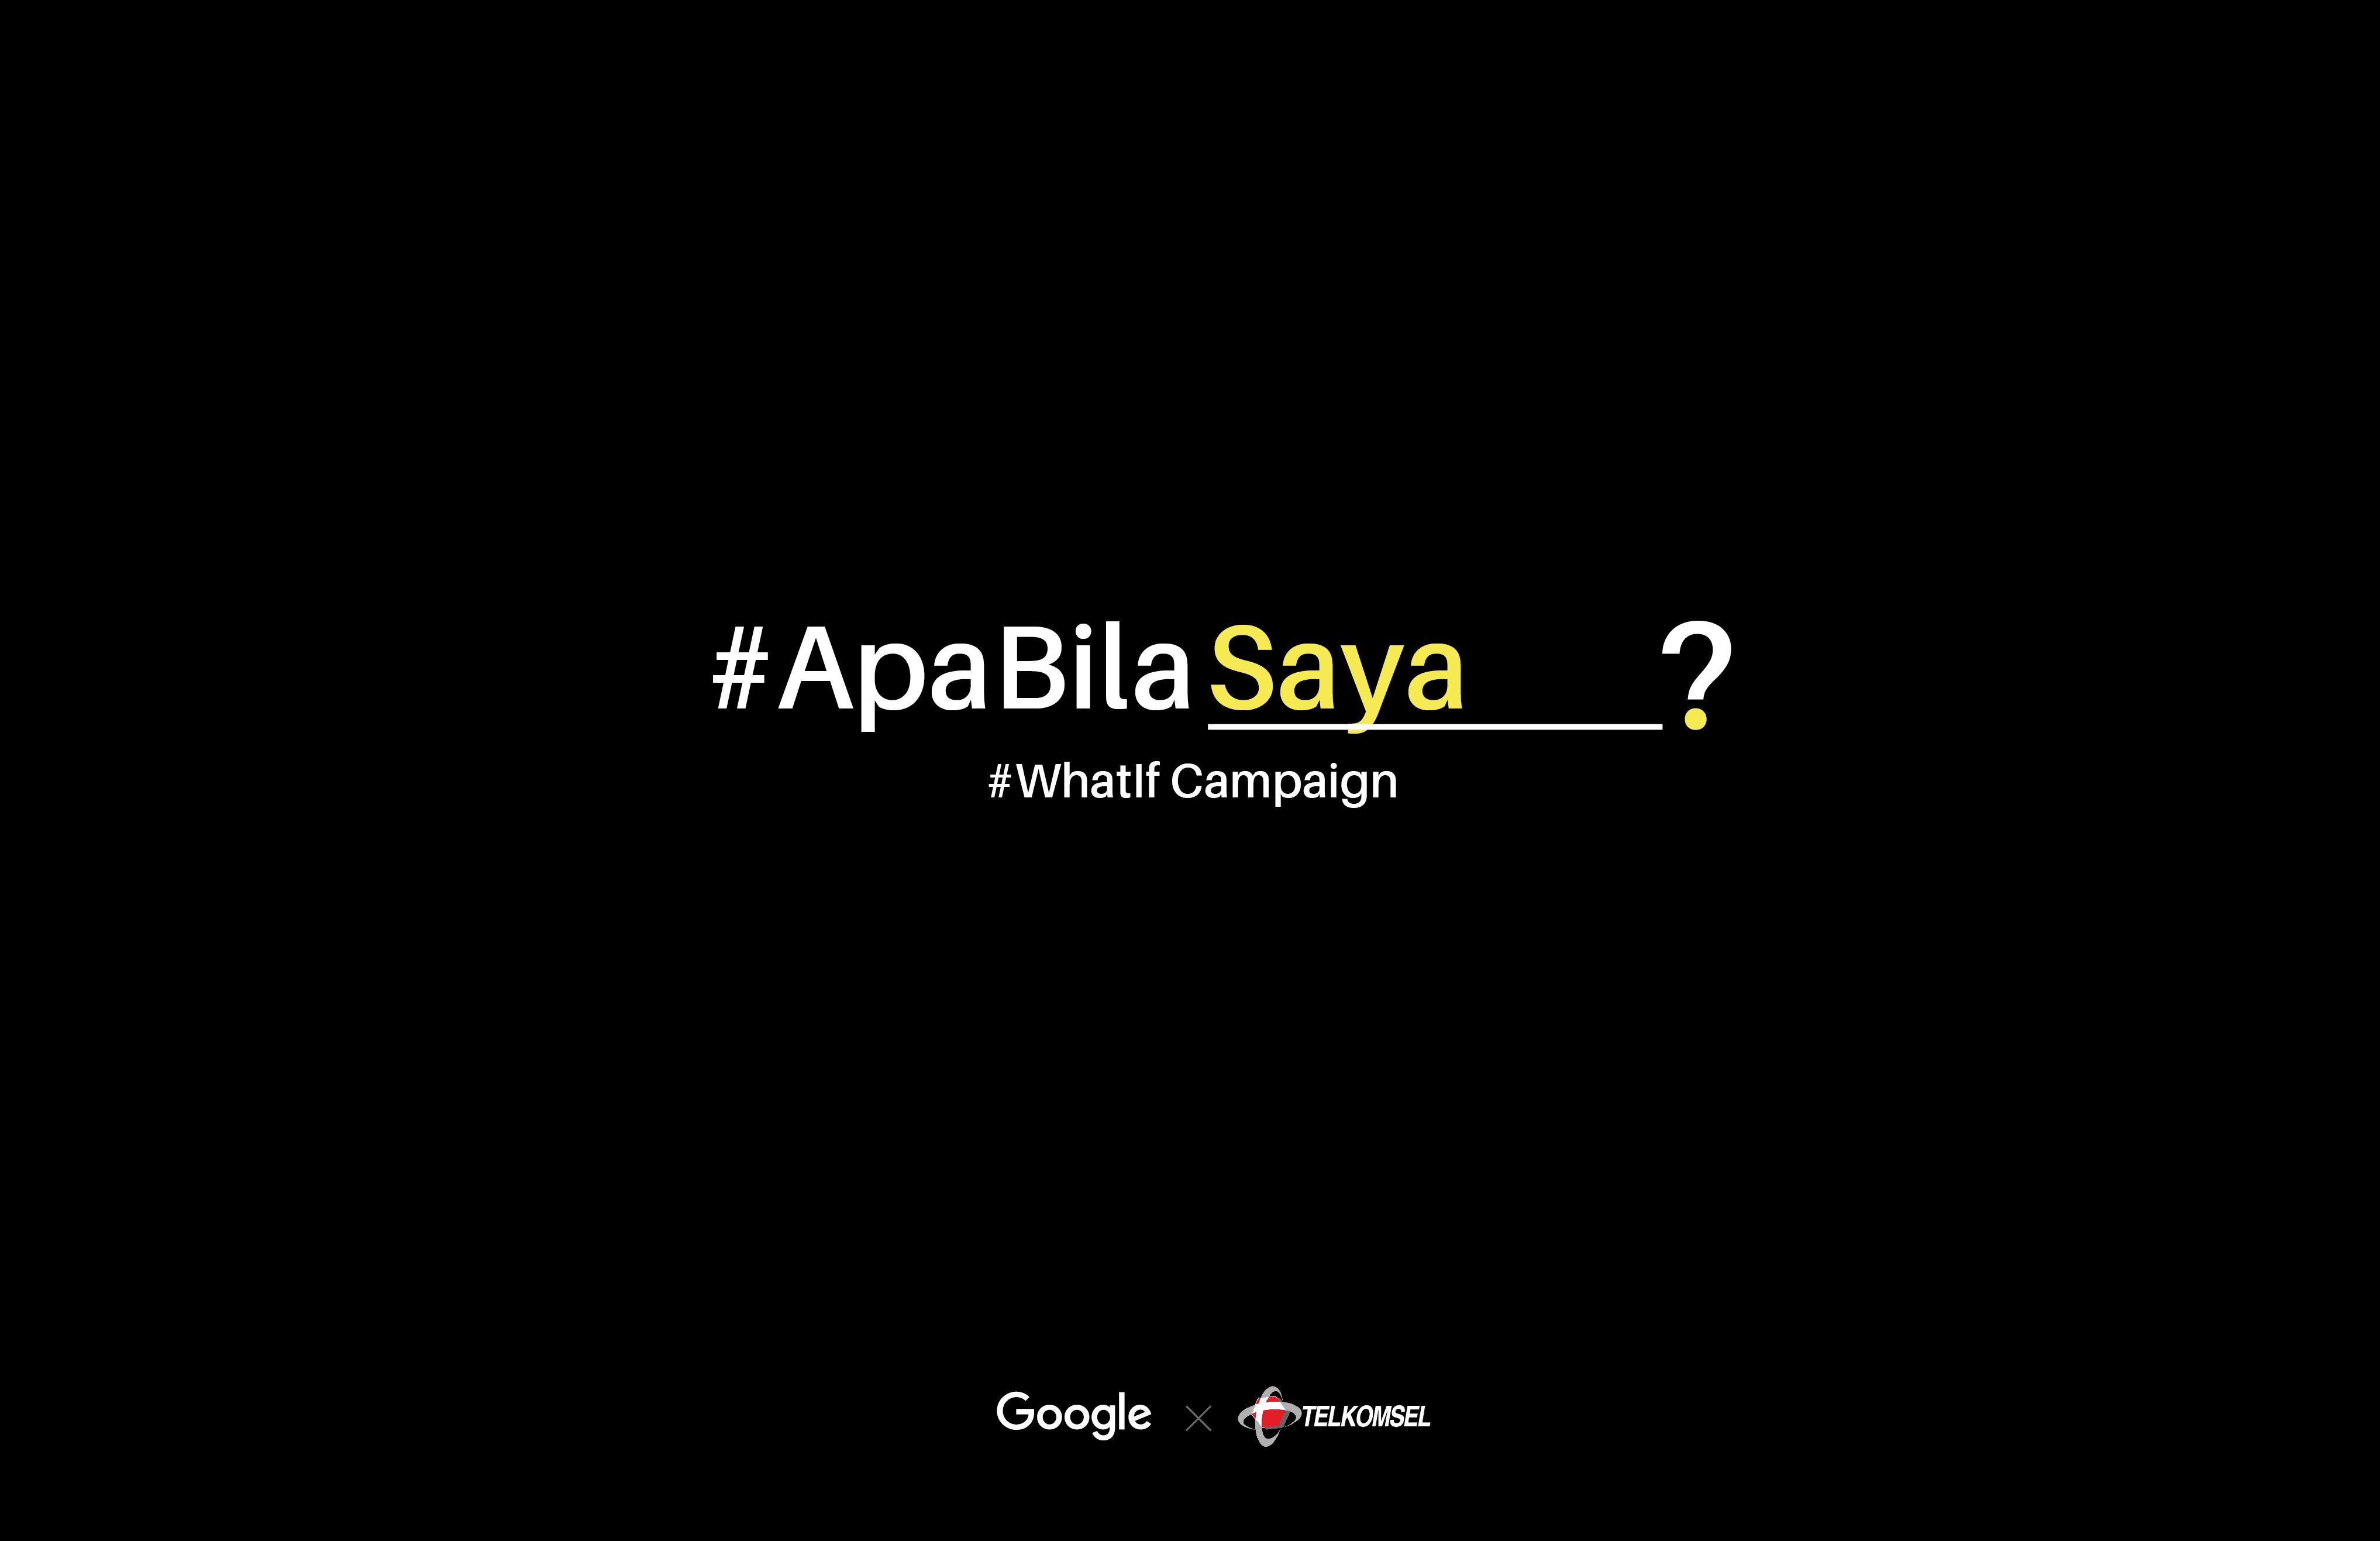 #ApaBilaSaya (What If) campaign